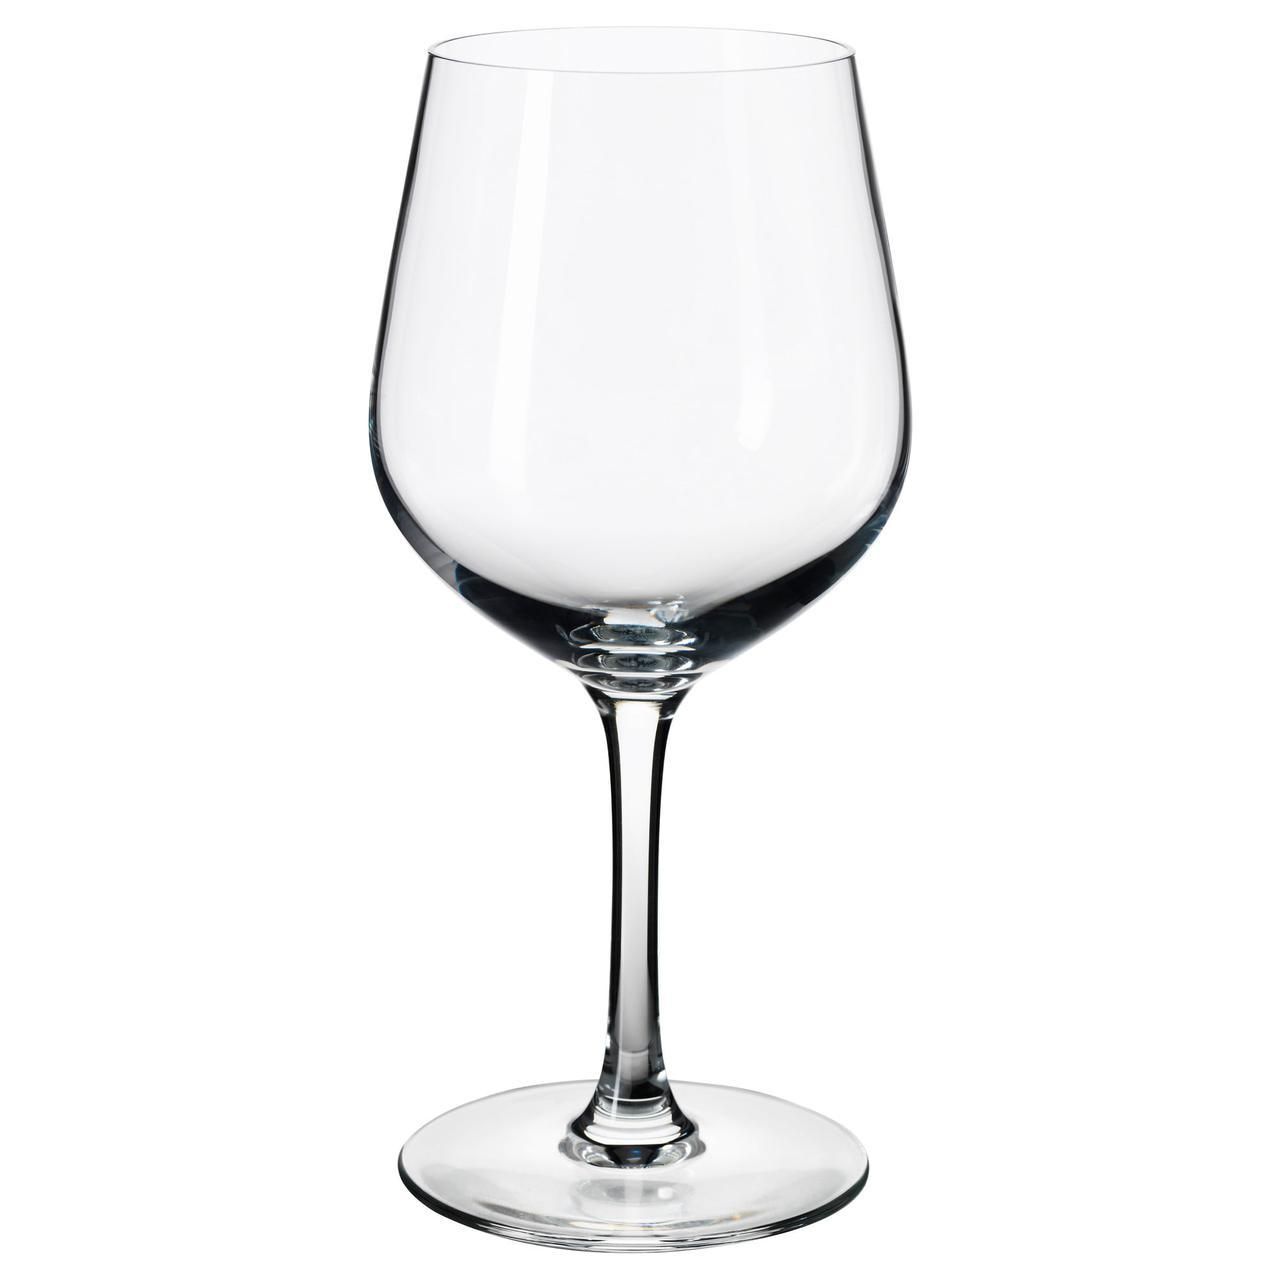 IKEA IVRIG (702.583.17) Бокал для красного вина, прозрачное стекло